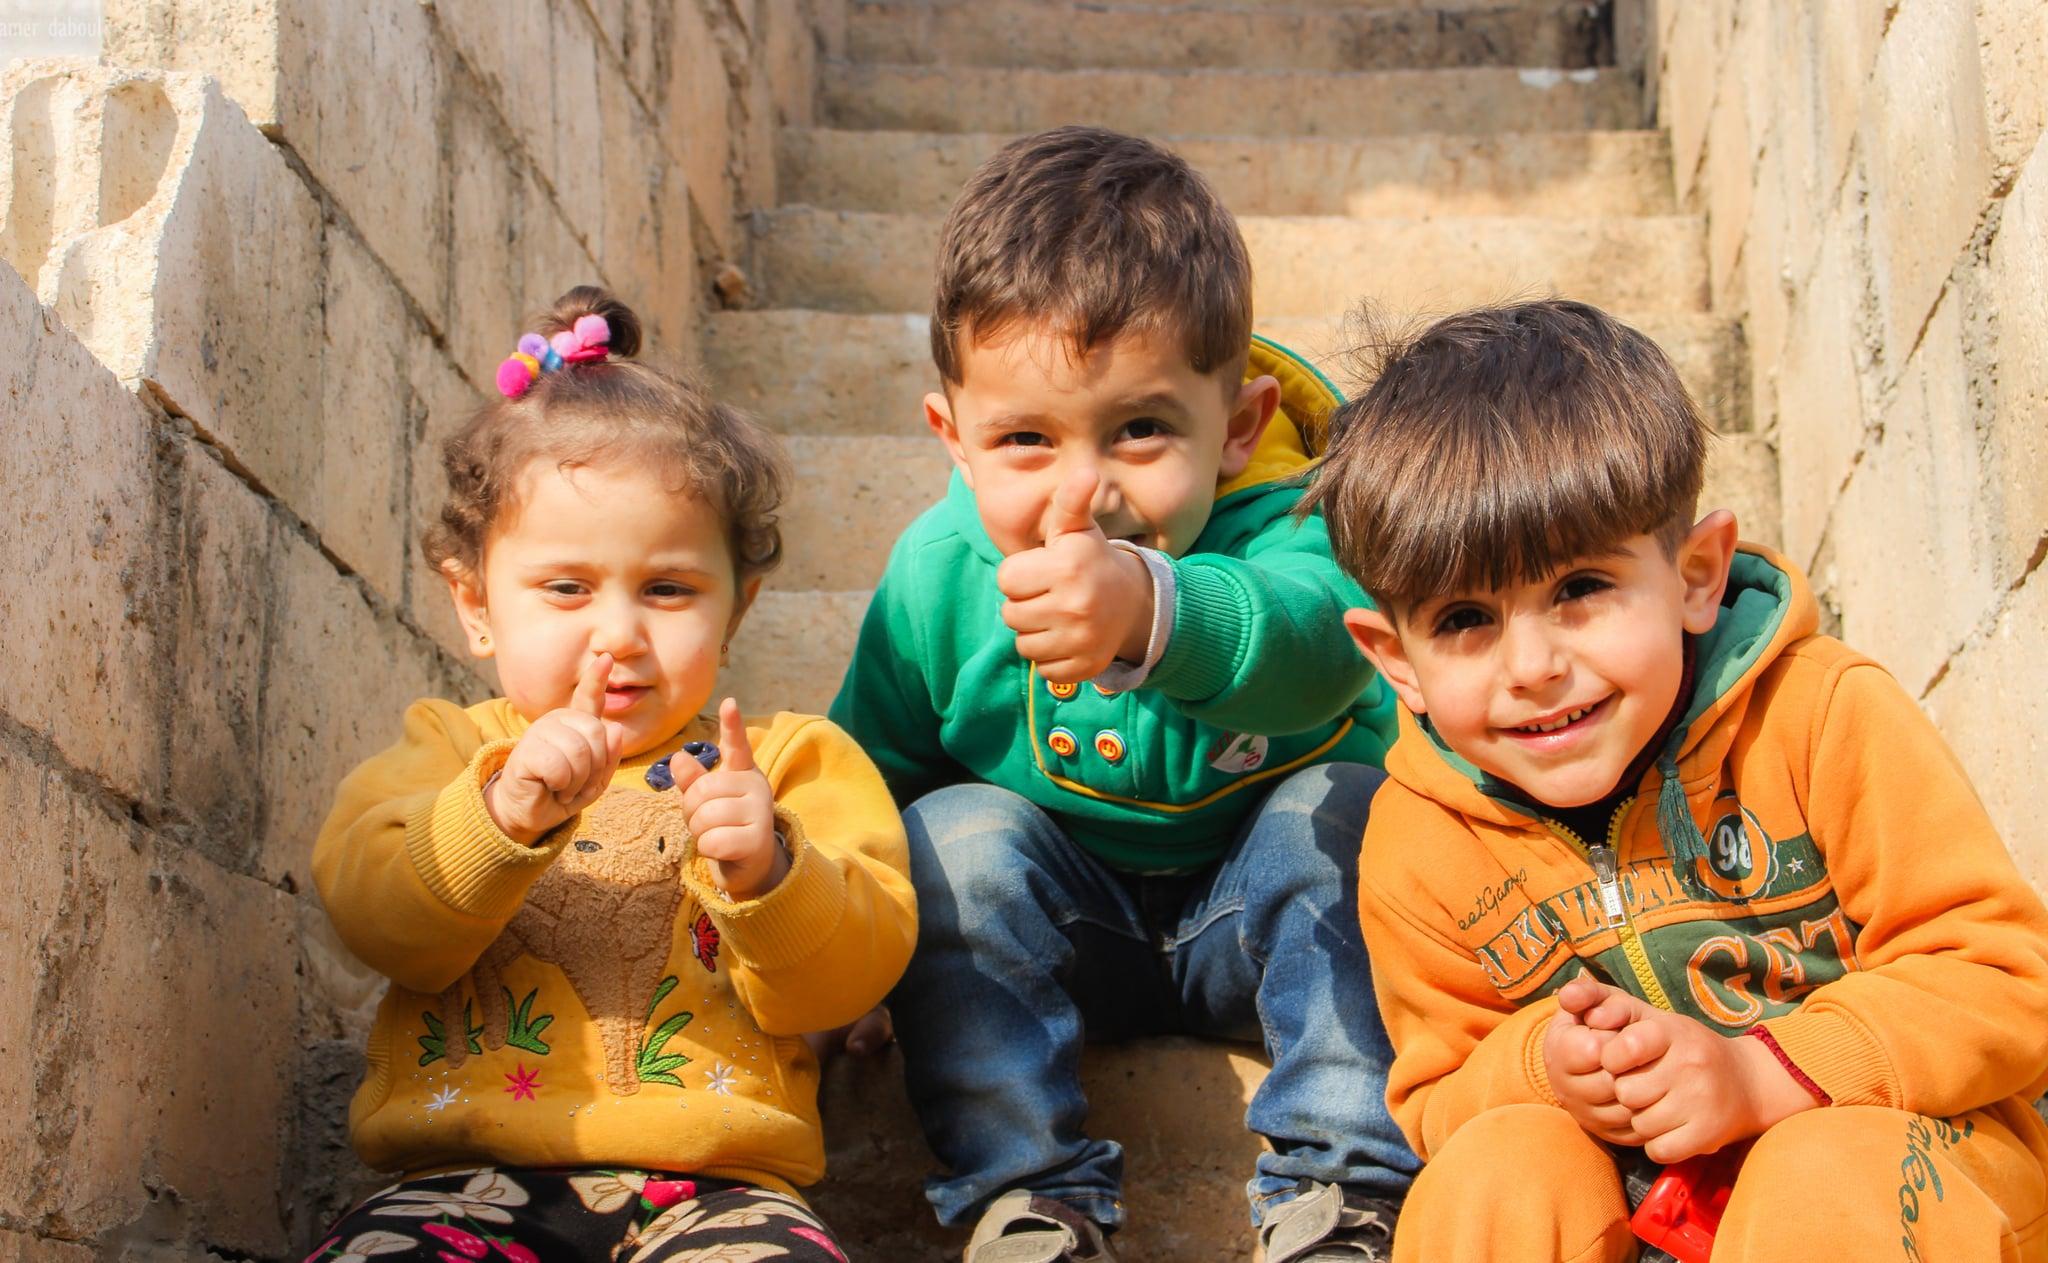 What It's Like Having Three Kids | POPSUGAR Family